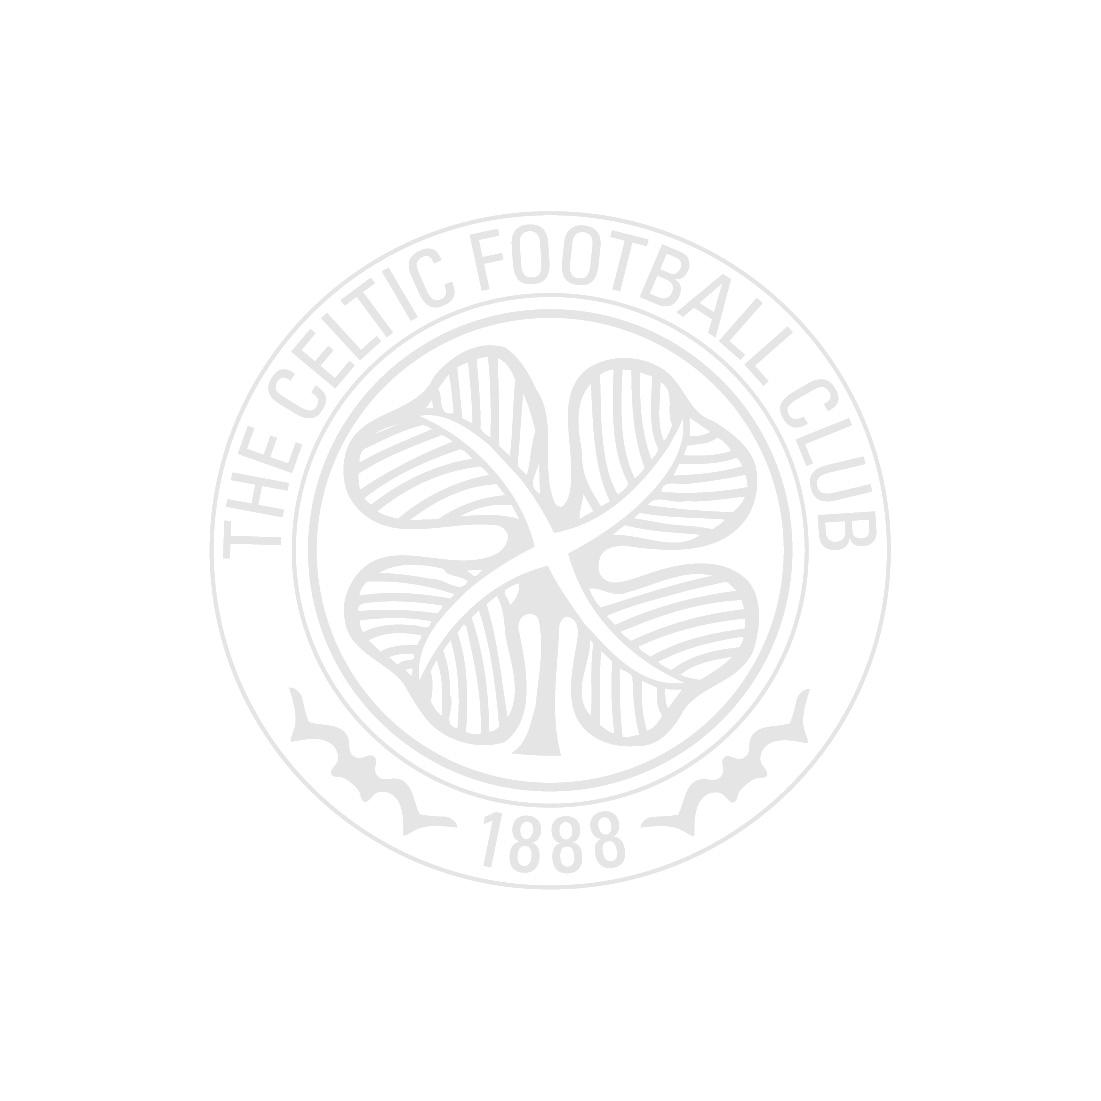 Hooped Star Print Ladies Celtic T-shirt